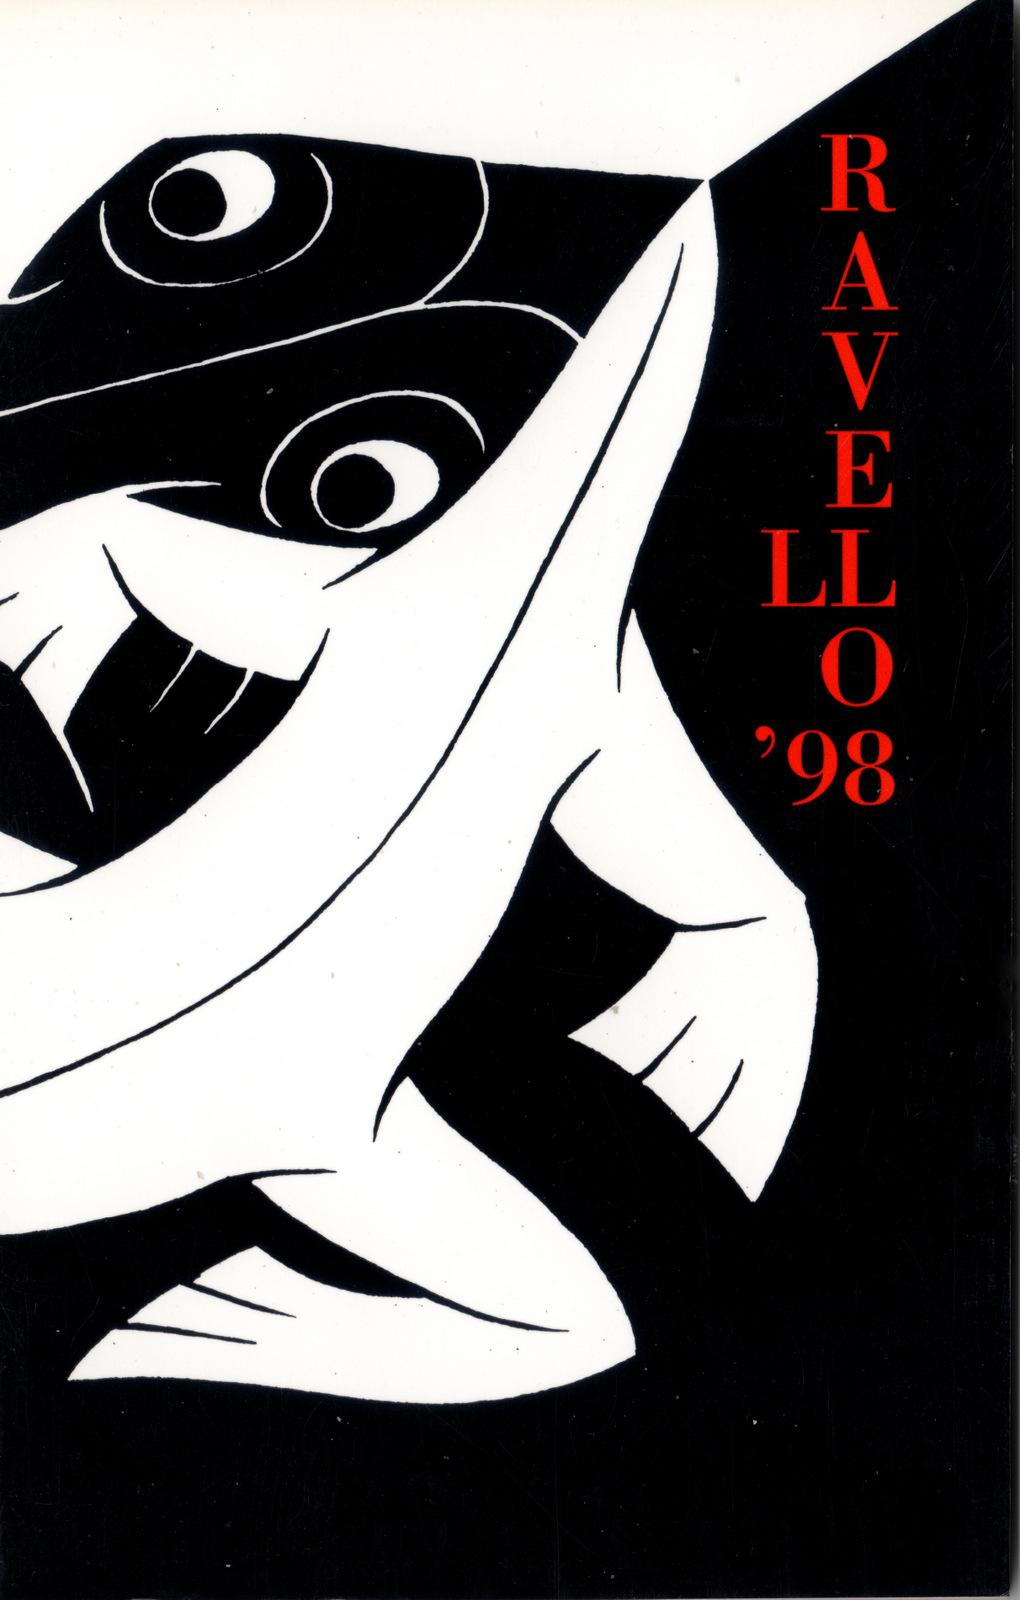 Manifesto Ravello 1998